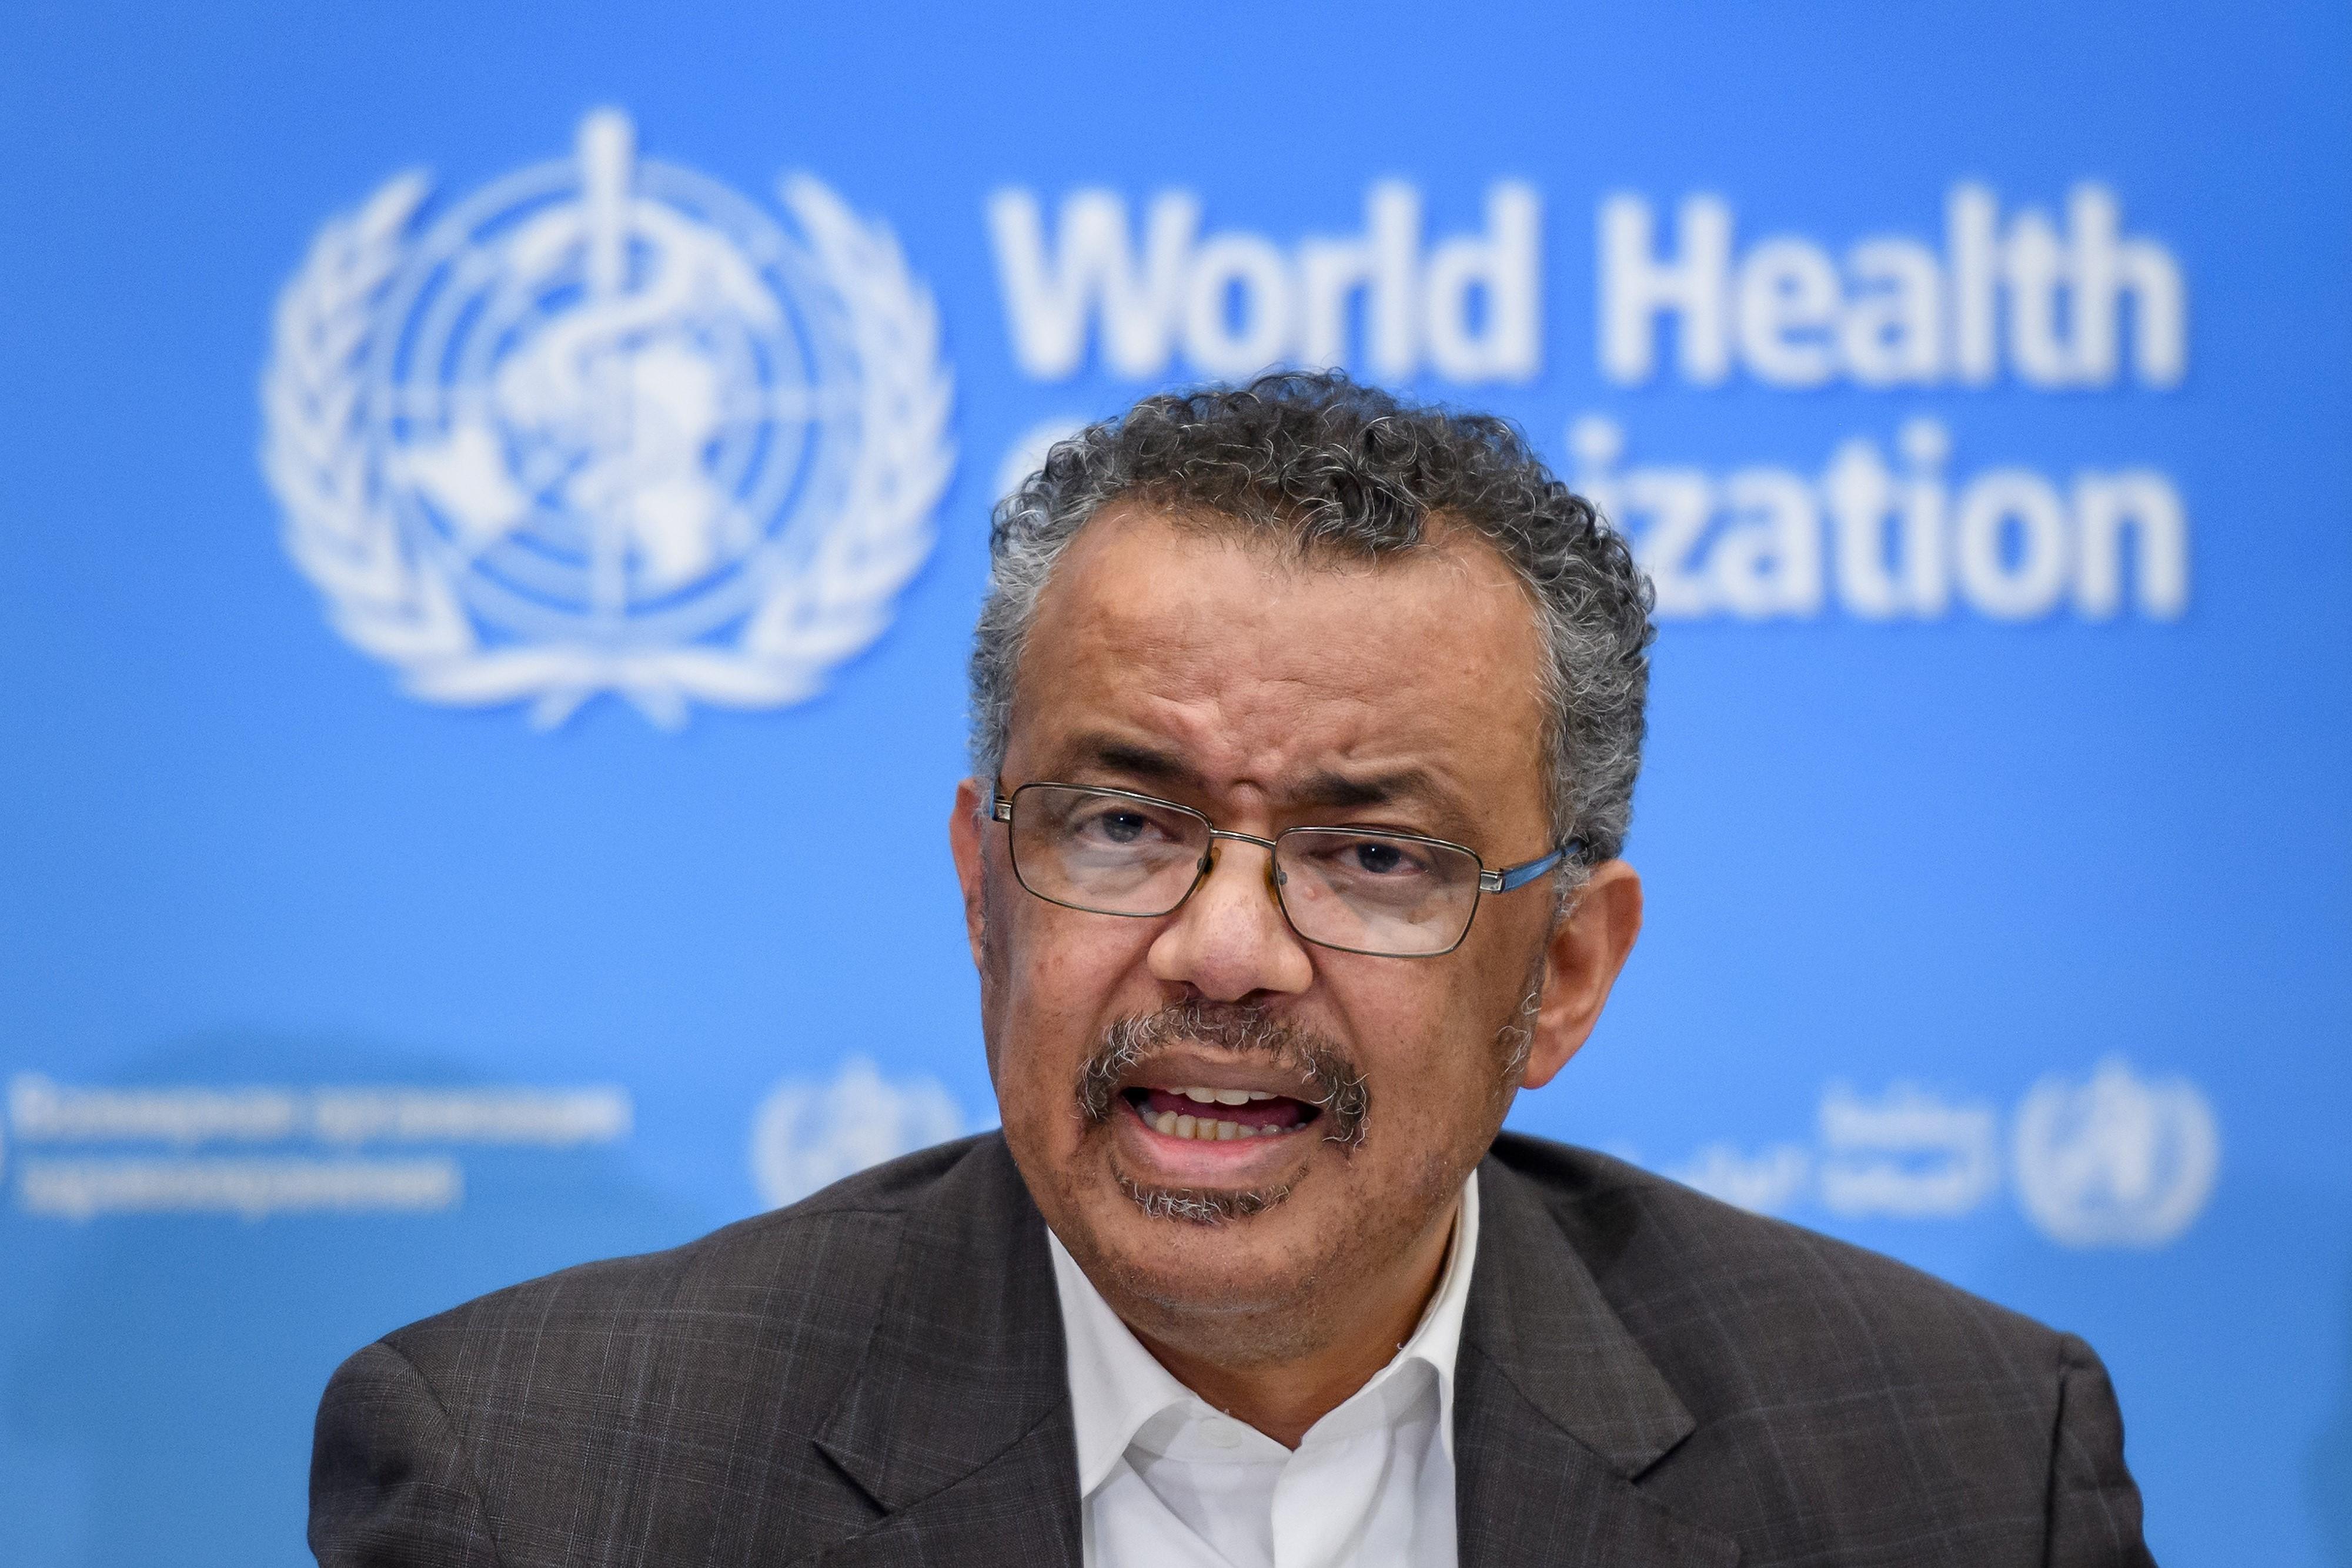 Cegah Muncul Stigma, WHO Tak Lagi Namai Varian Covid Sesuai Negara